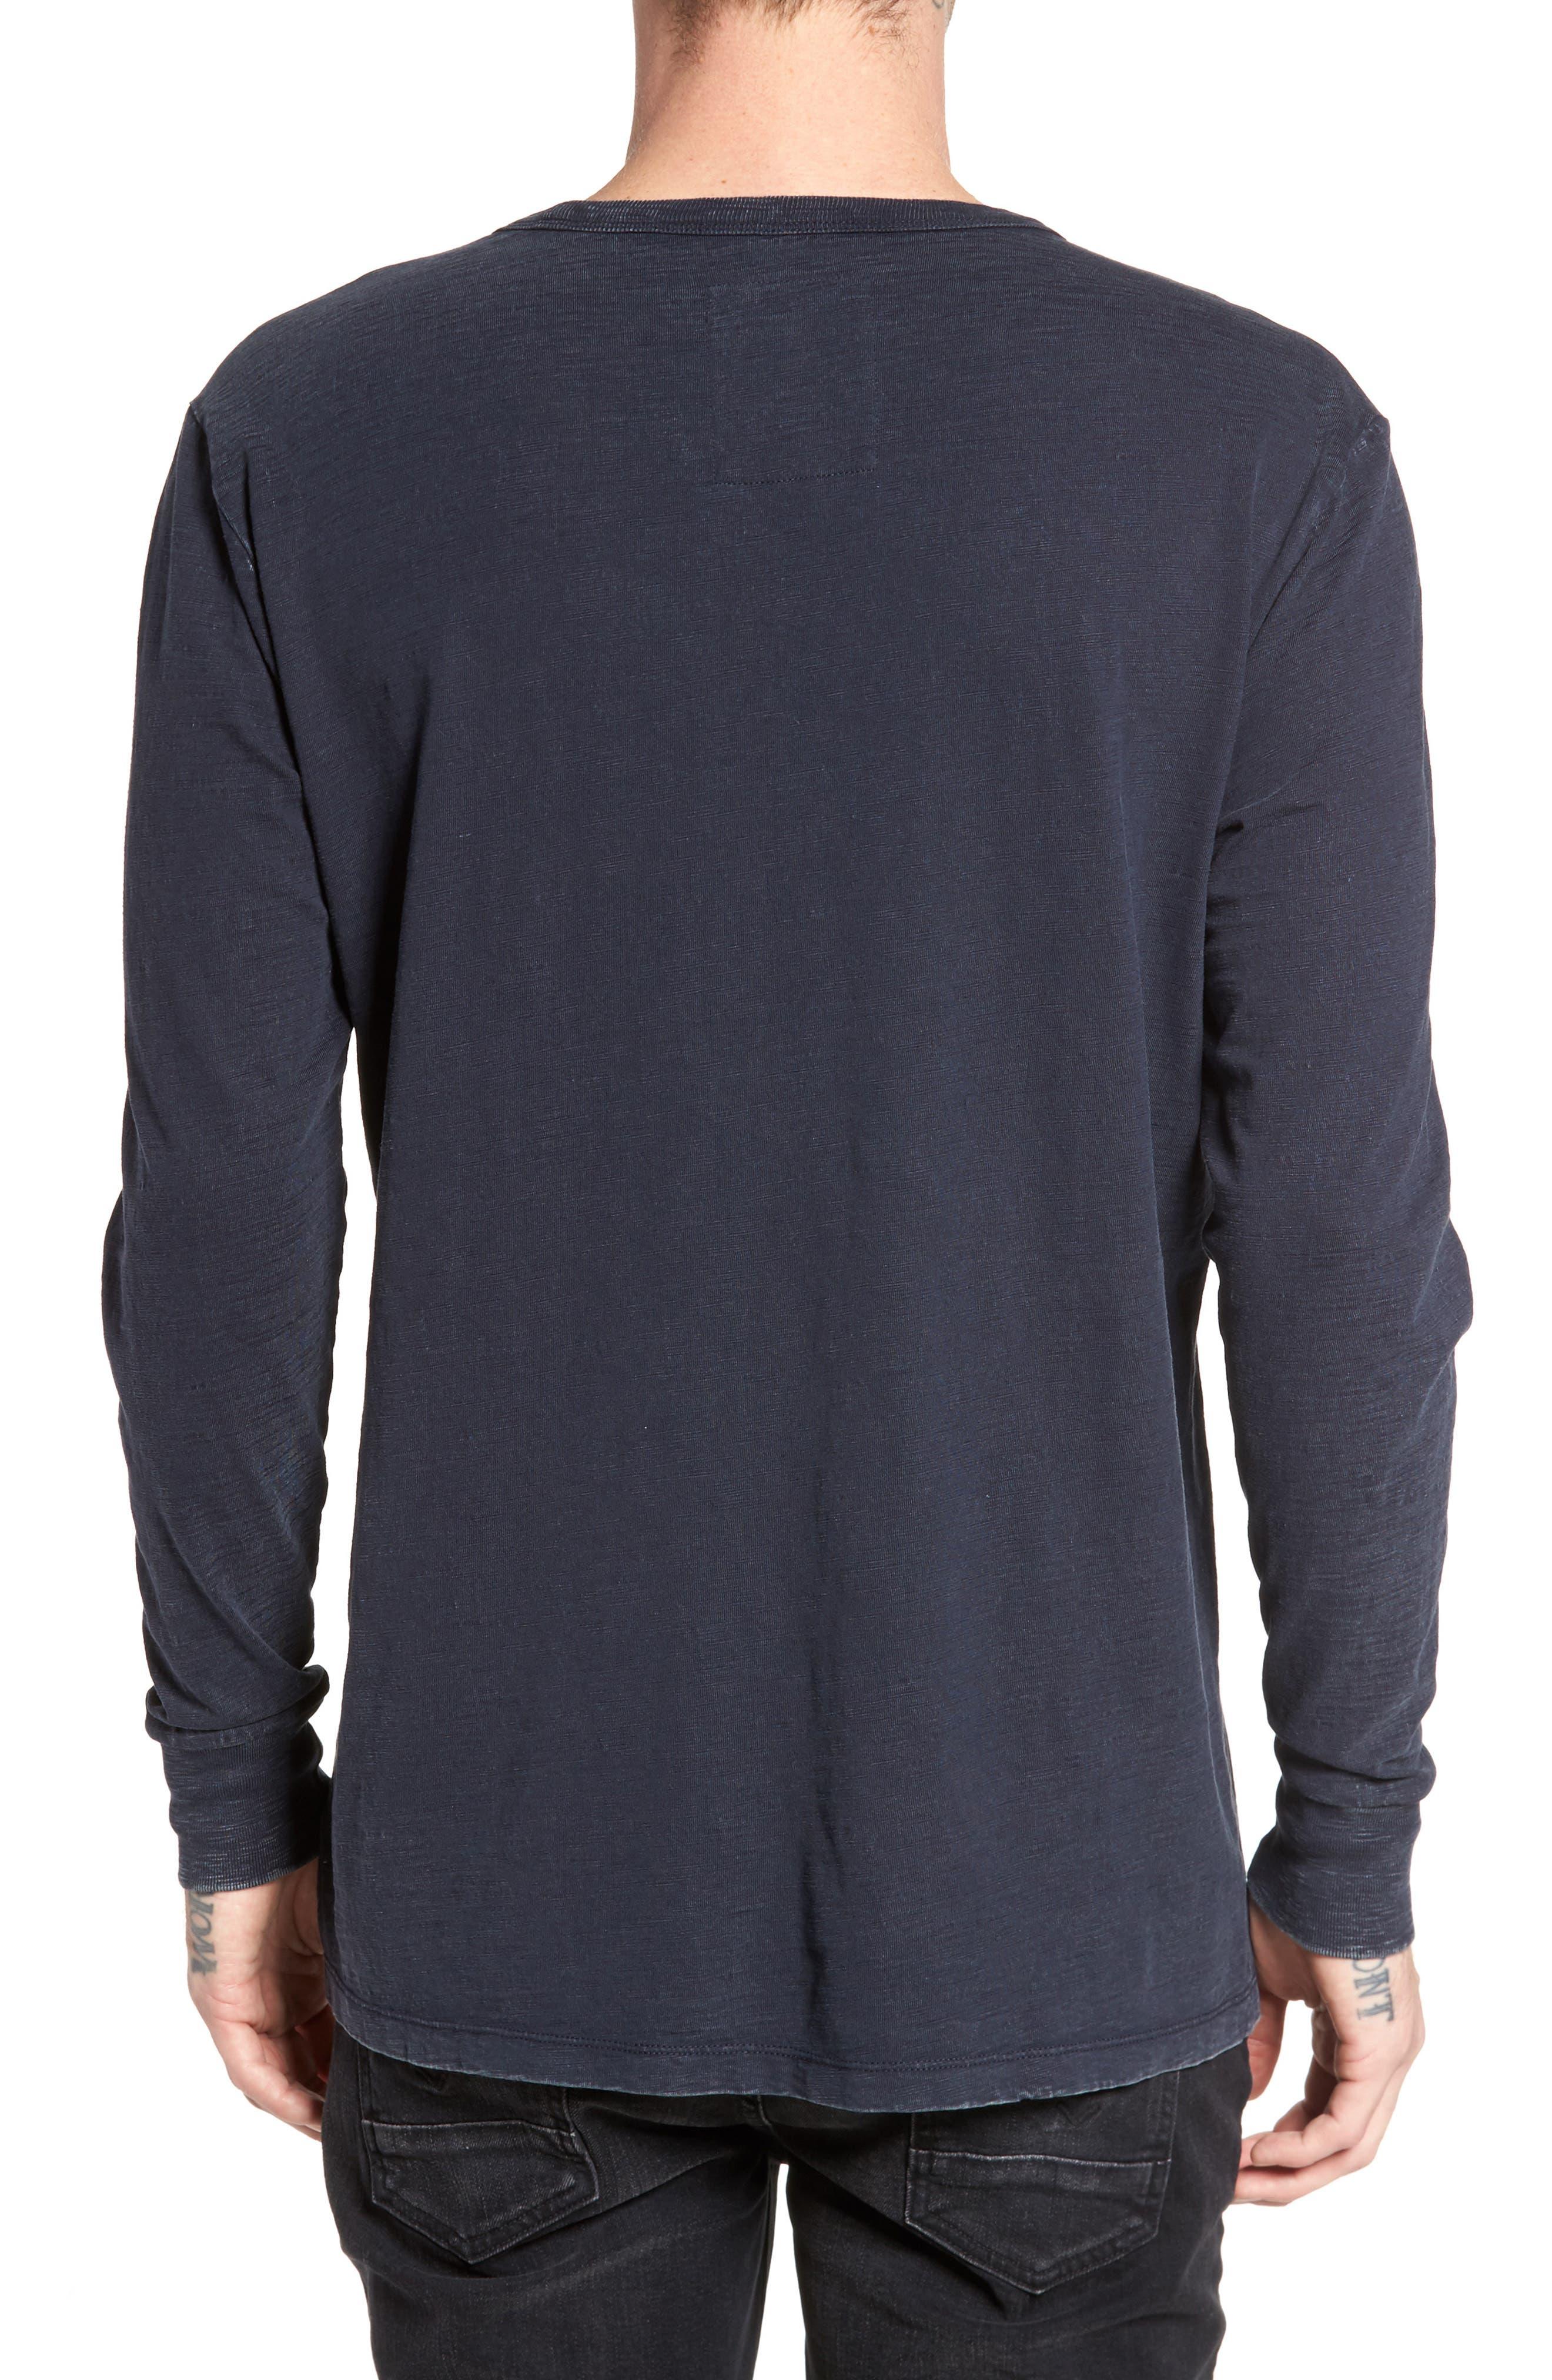 Kantano T-Shirt,                             Alternate thumbnail 2, color,                             400